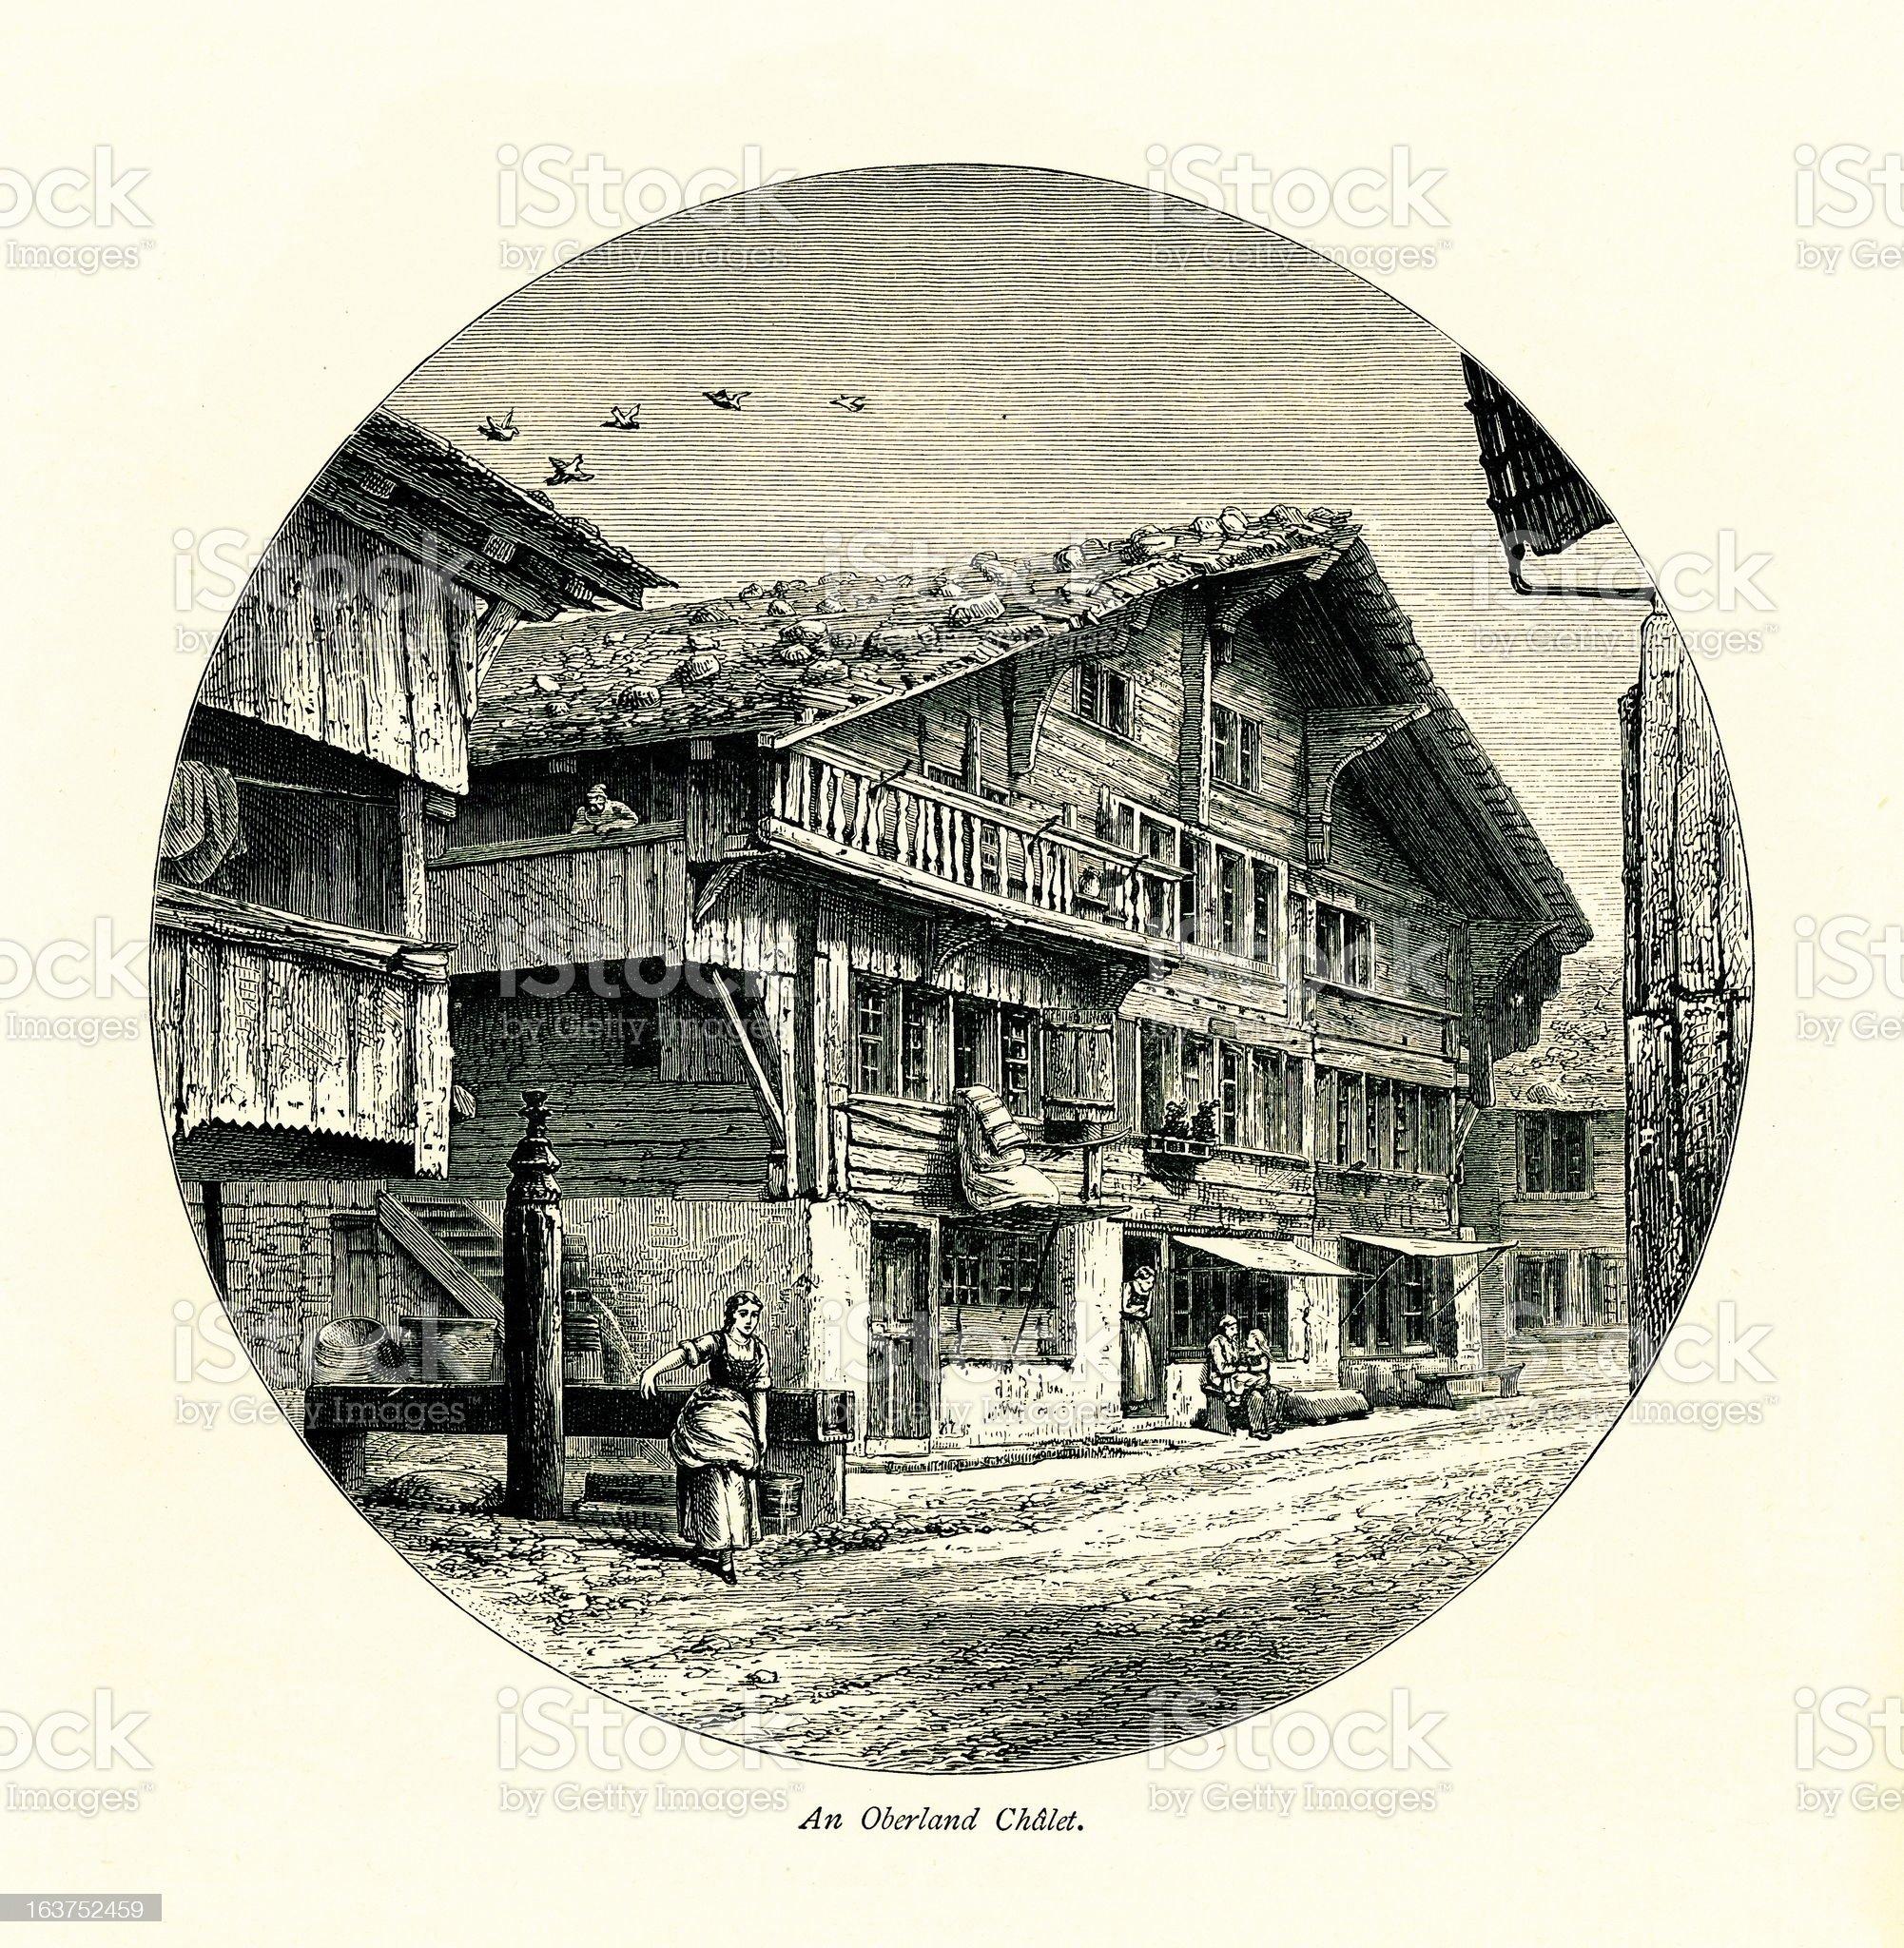 Oberland chalet, Switzerland I Antique European Illustrations royalty-free stock vector art